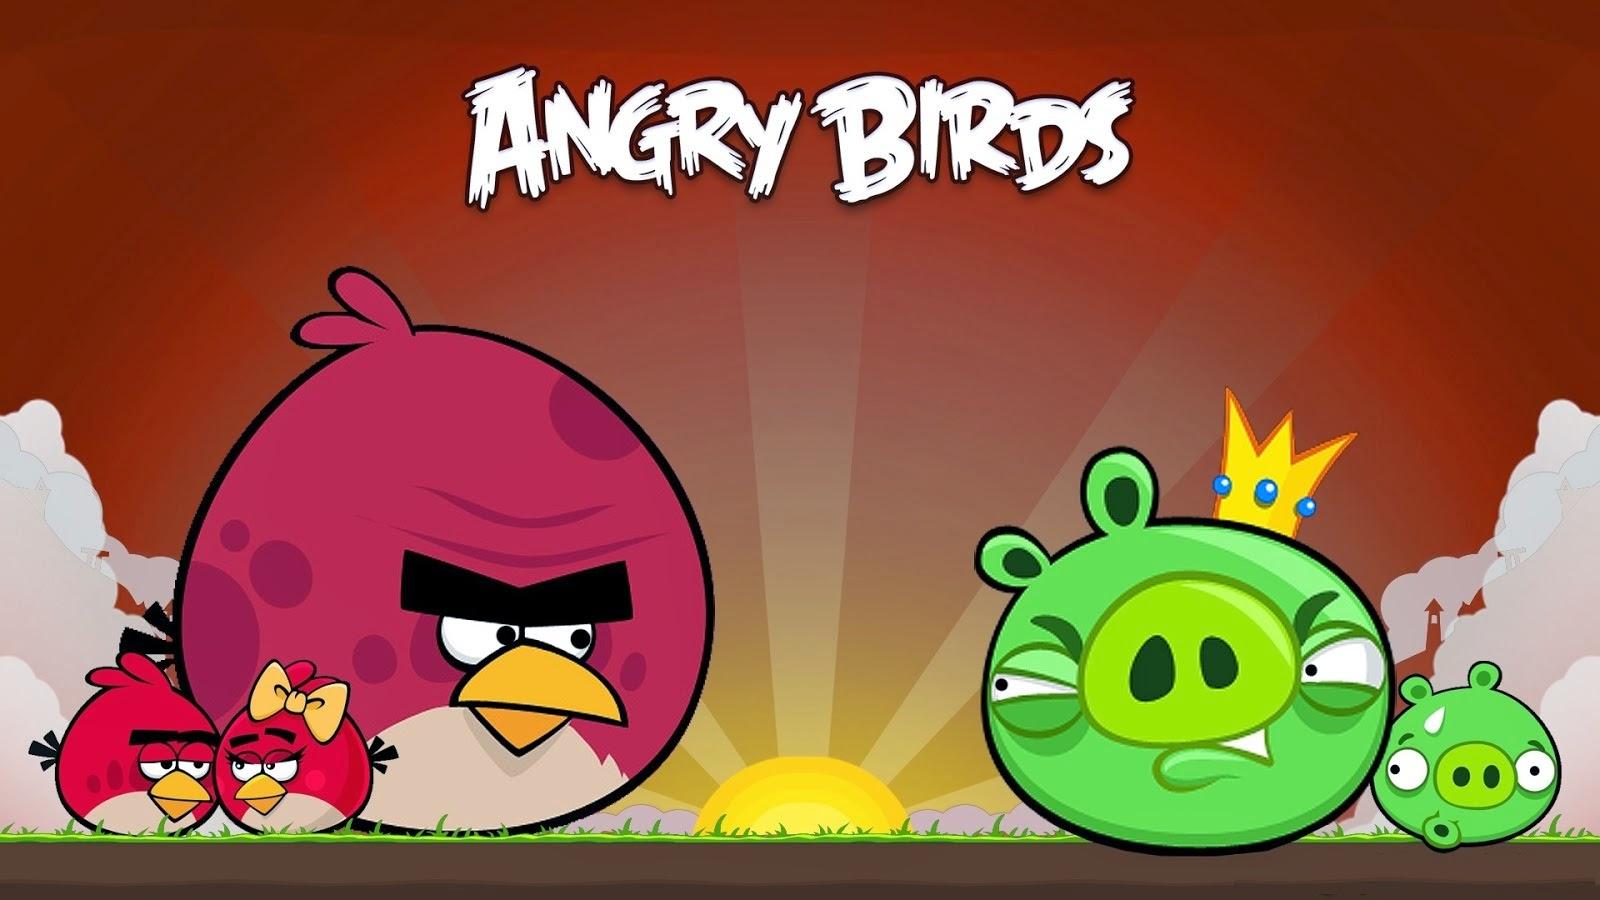 Angry Birds: Gambar Lucu Terbaru Cartoon